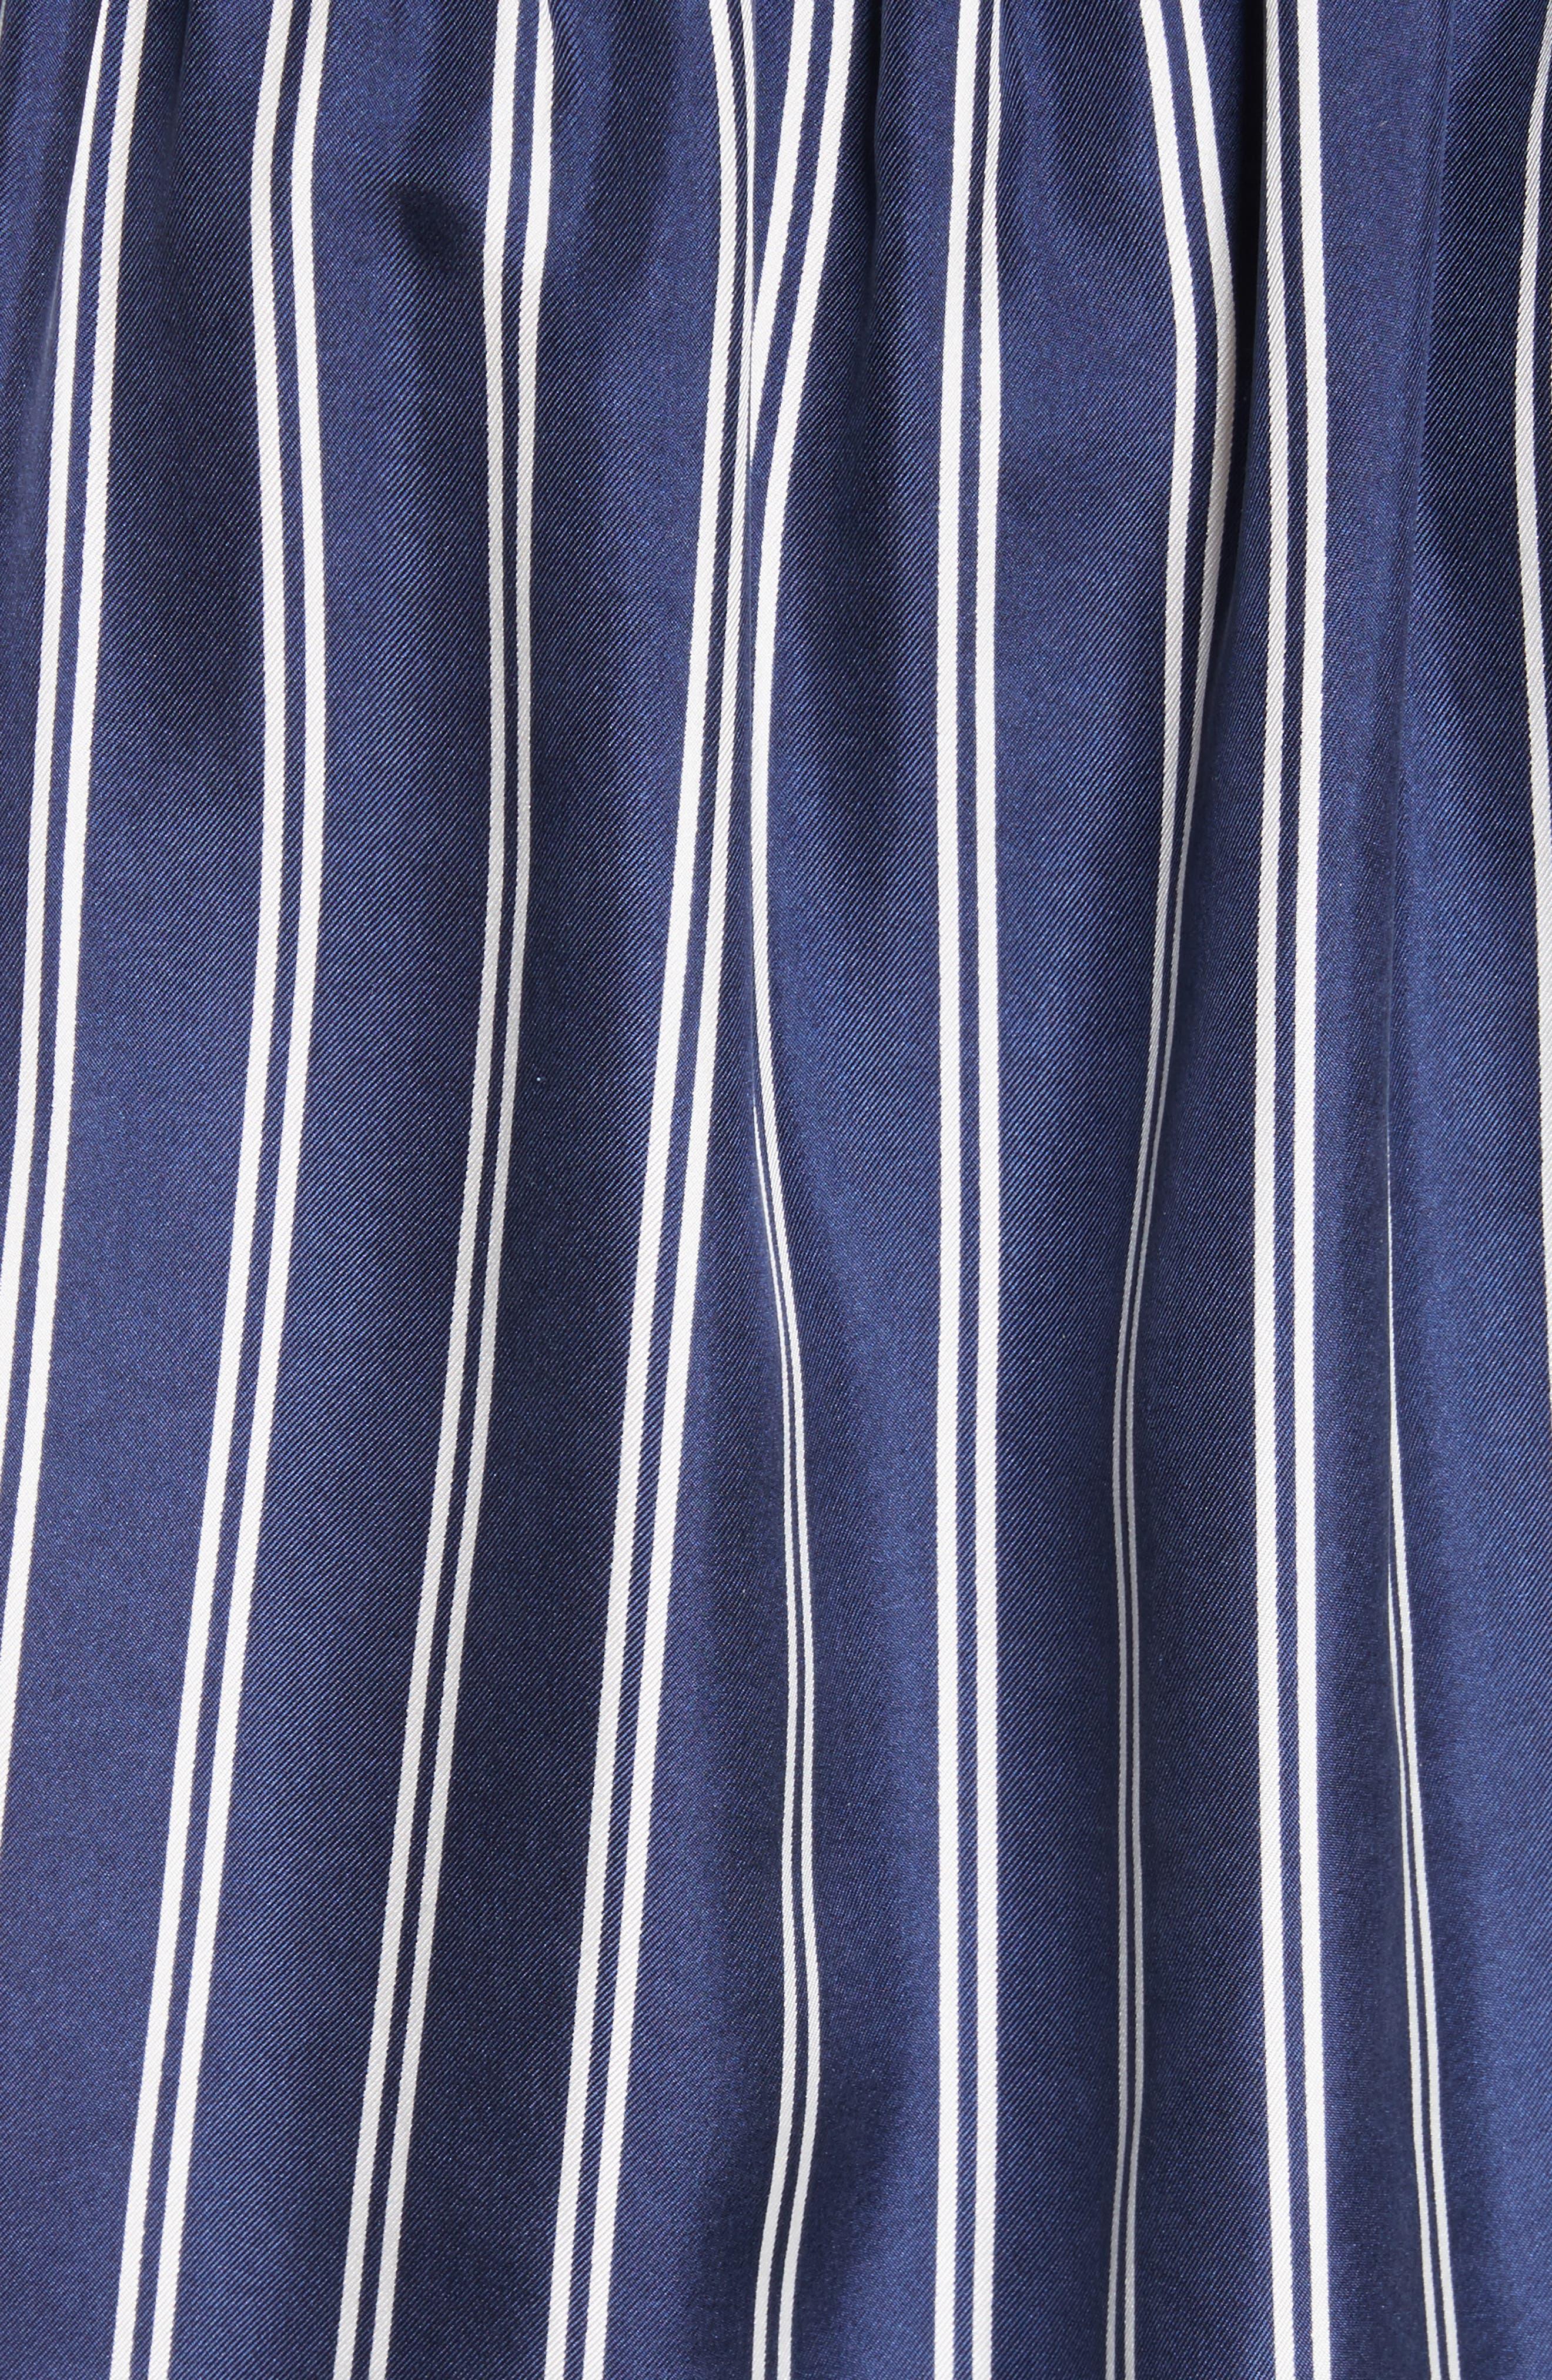 Adiba Stripe Silk Shirt,                             Alternate thumbnail 5, color,                             418